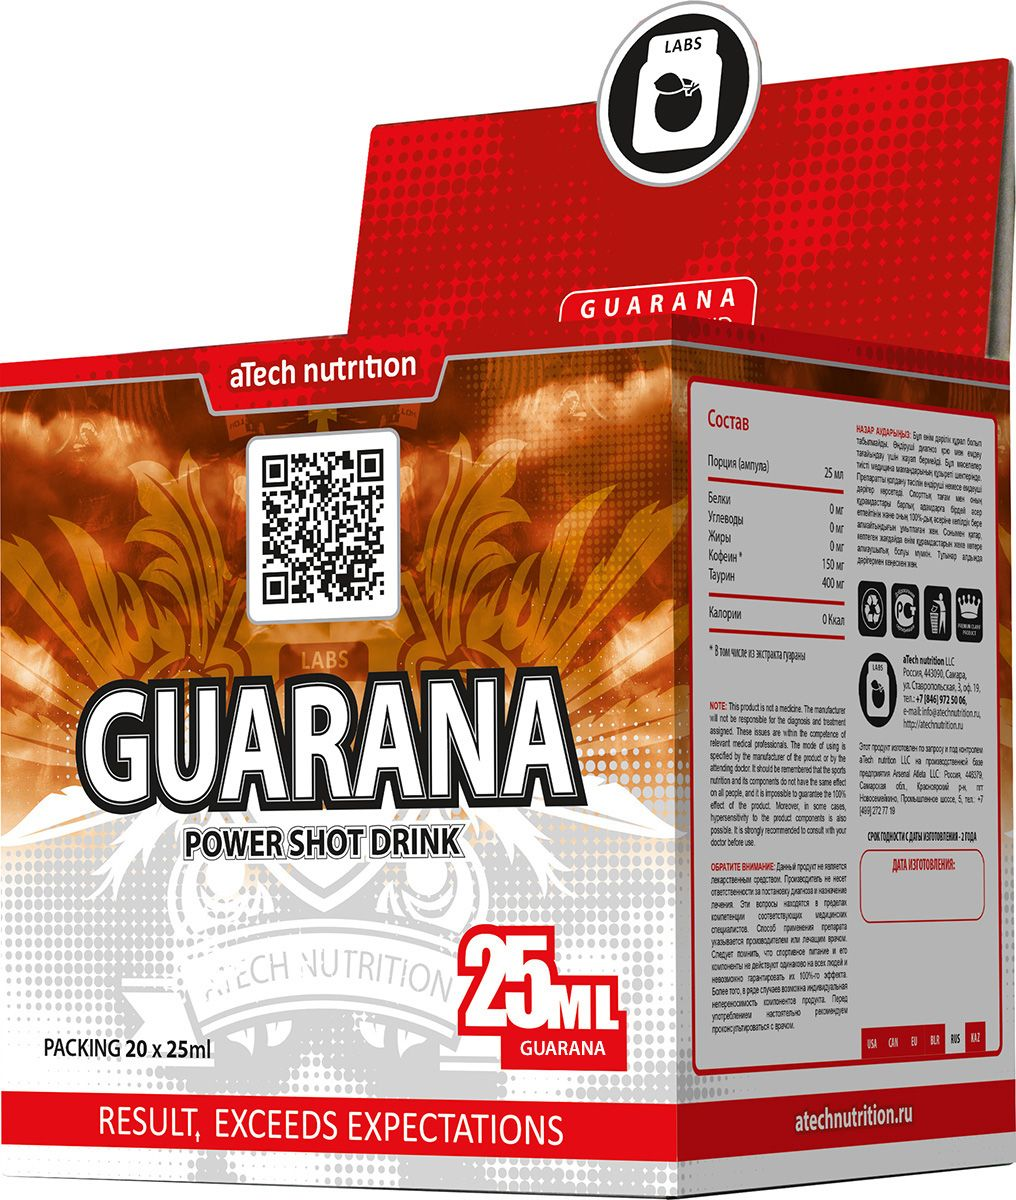 Энергетический напиток aTech Nutrition  Guarana Power Shot Drink , гуарана, 25 мл, 20 шт - Энергетики